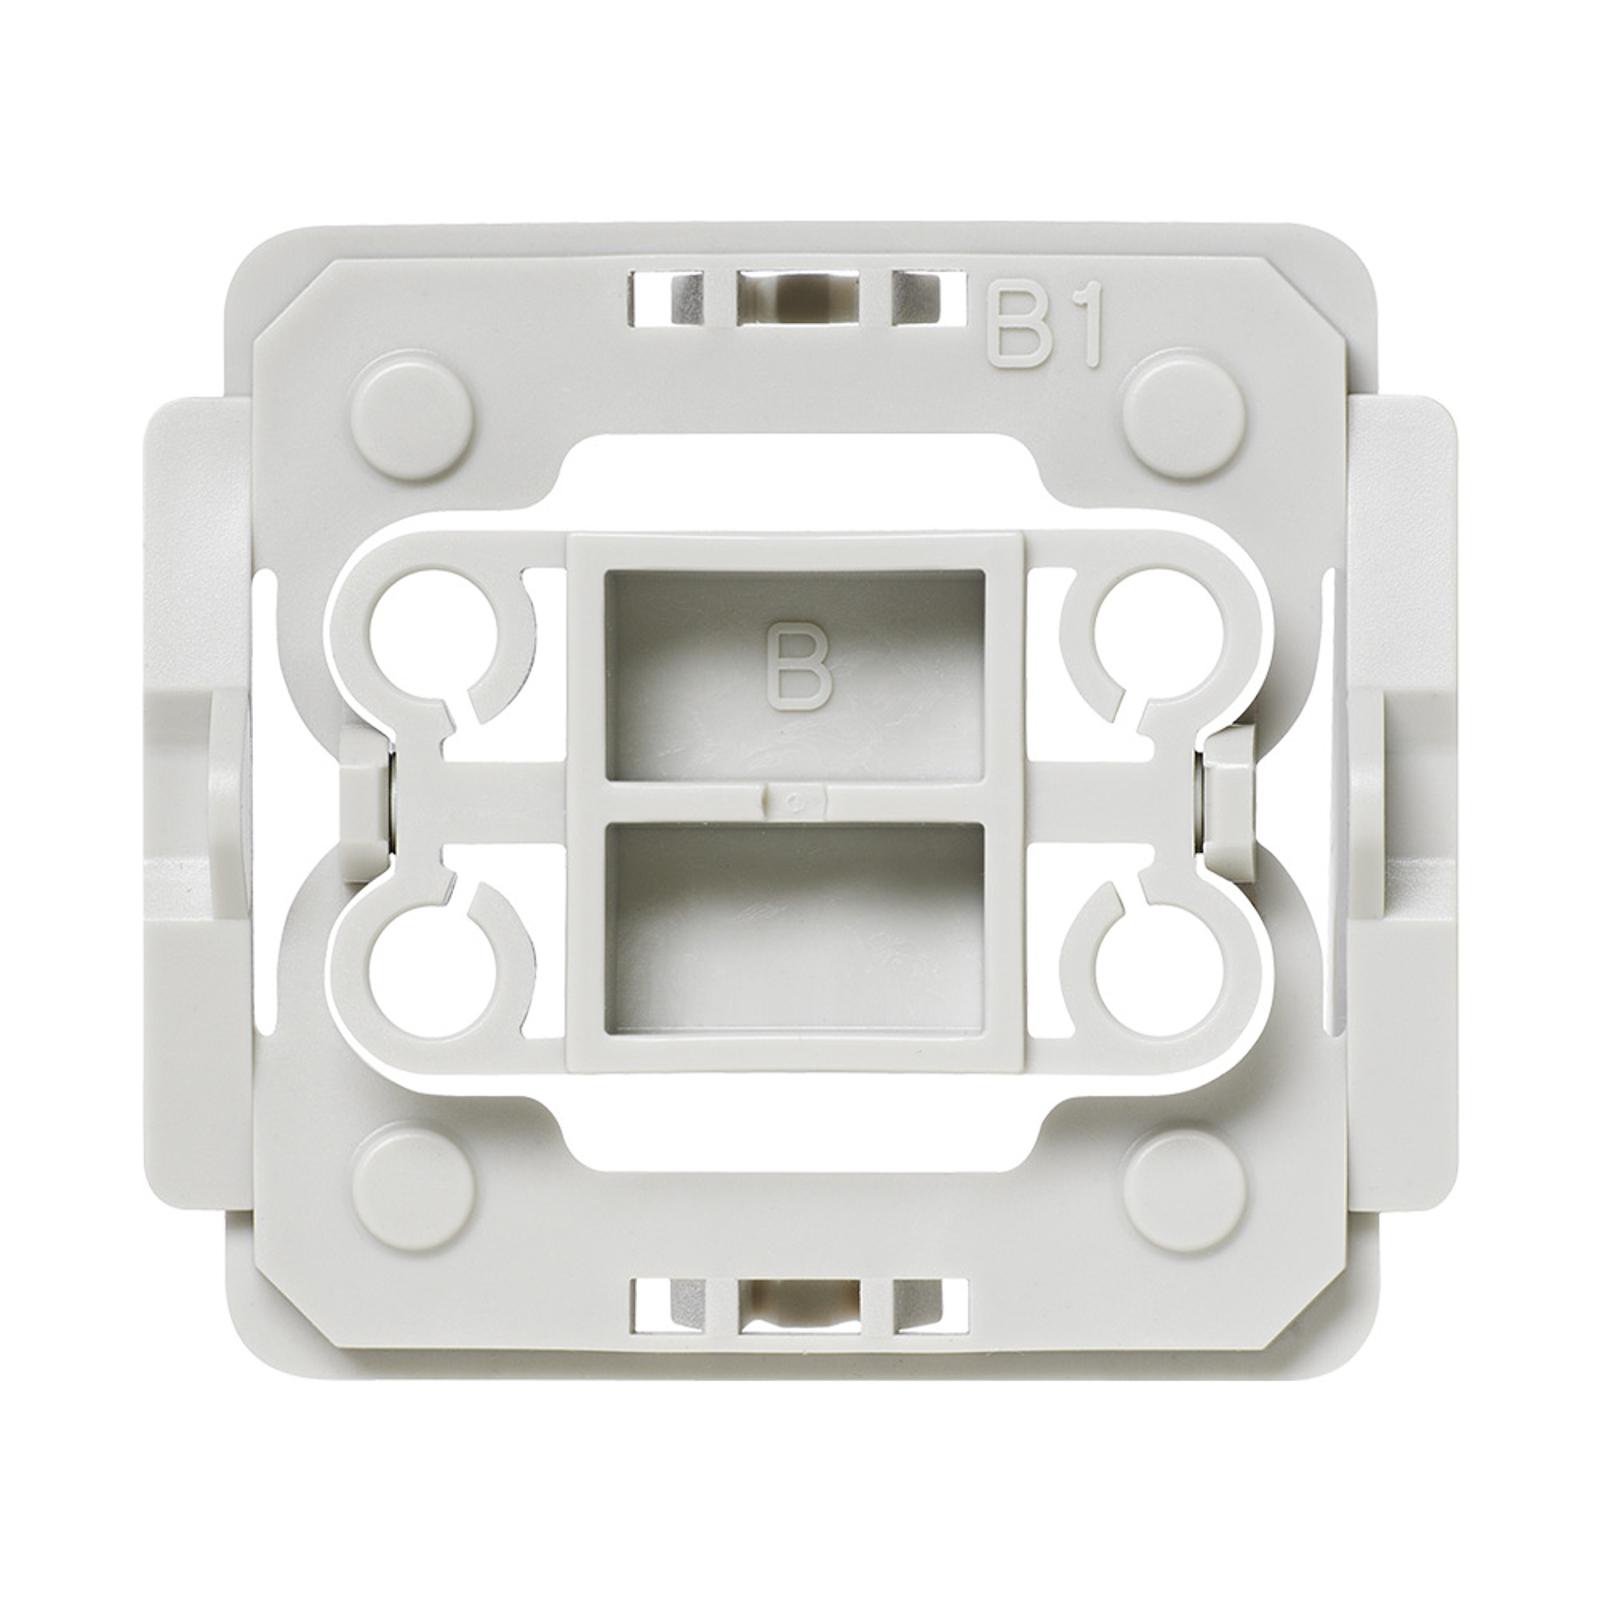 Homematic IP-adapter for Berker-bryter B1 1x